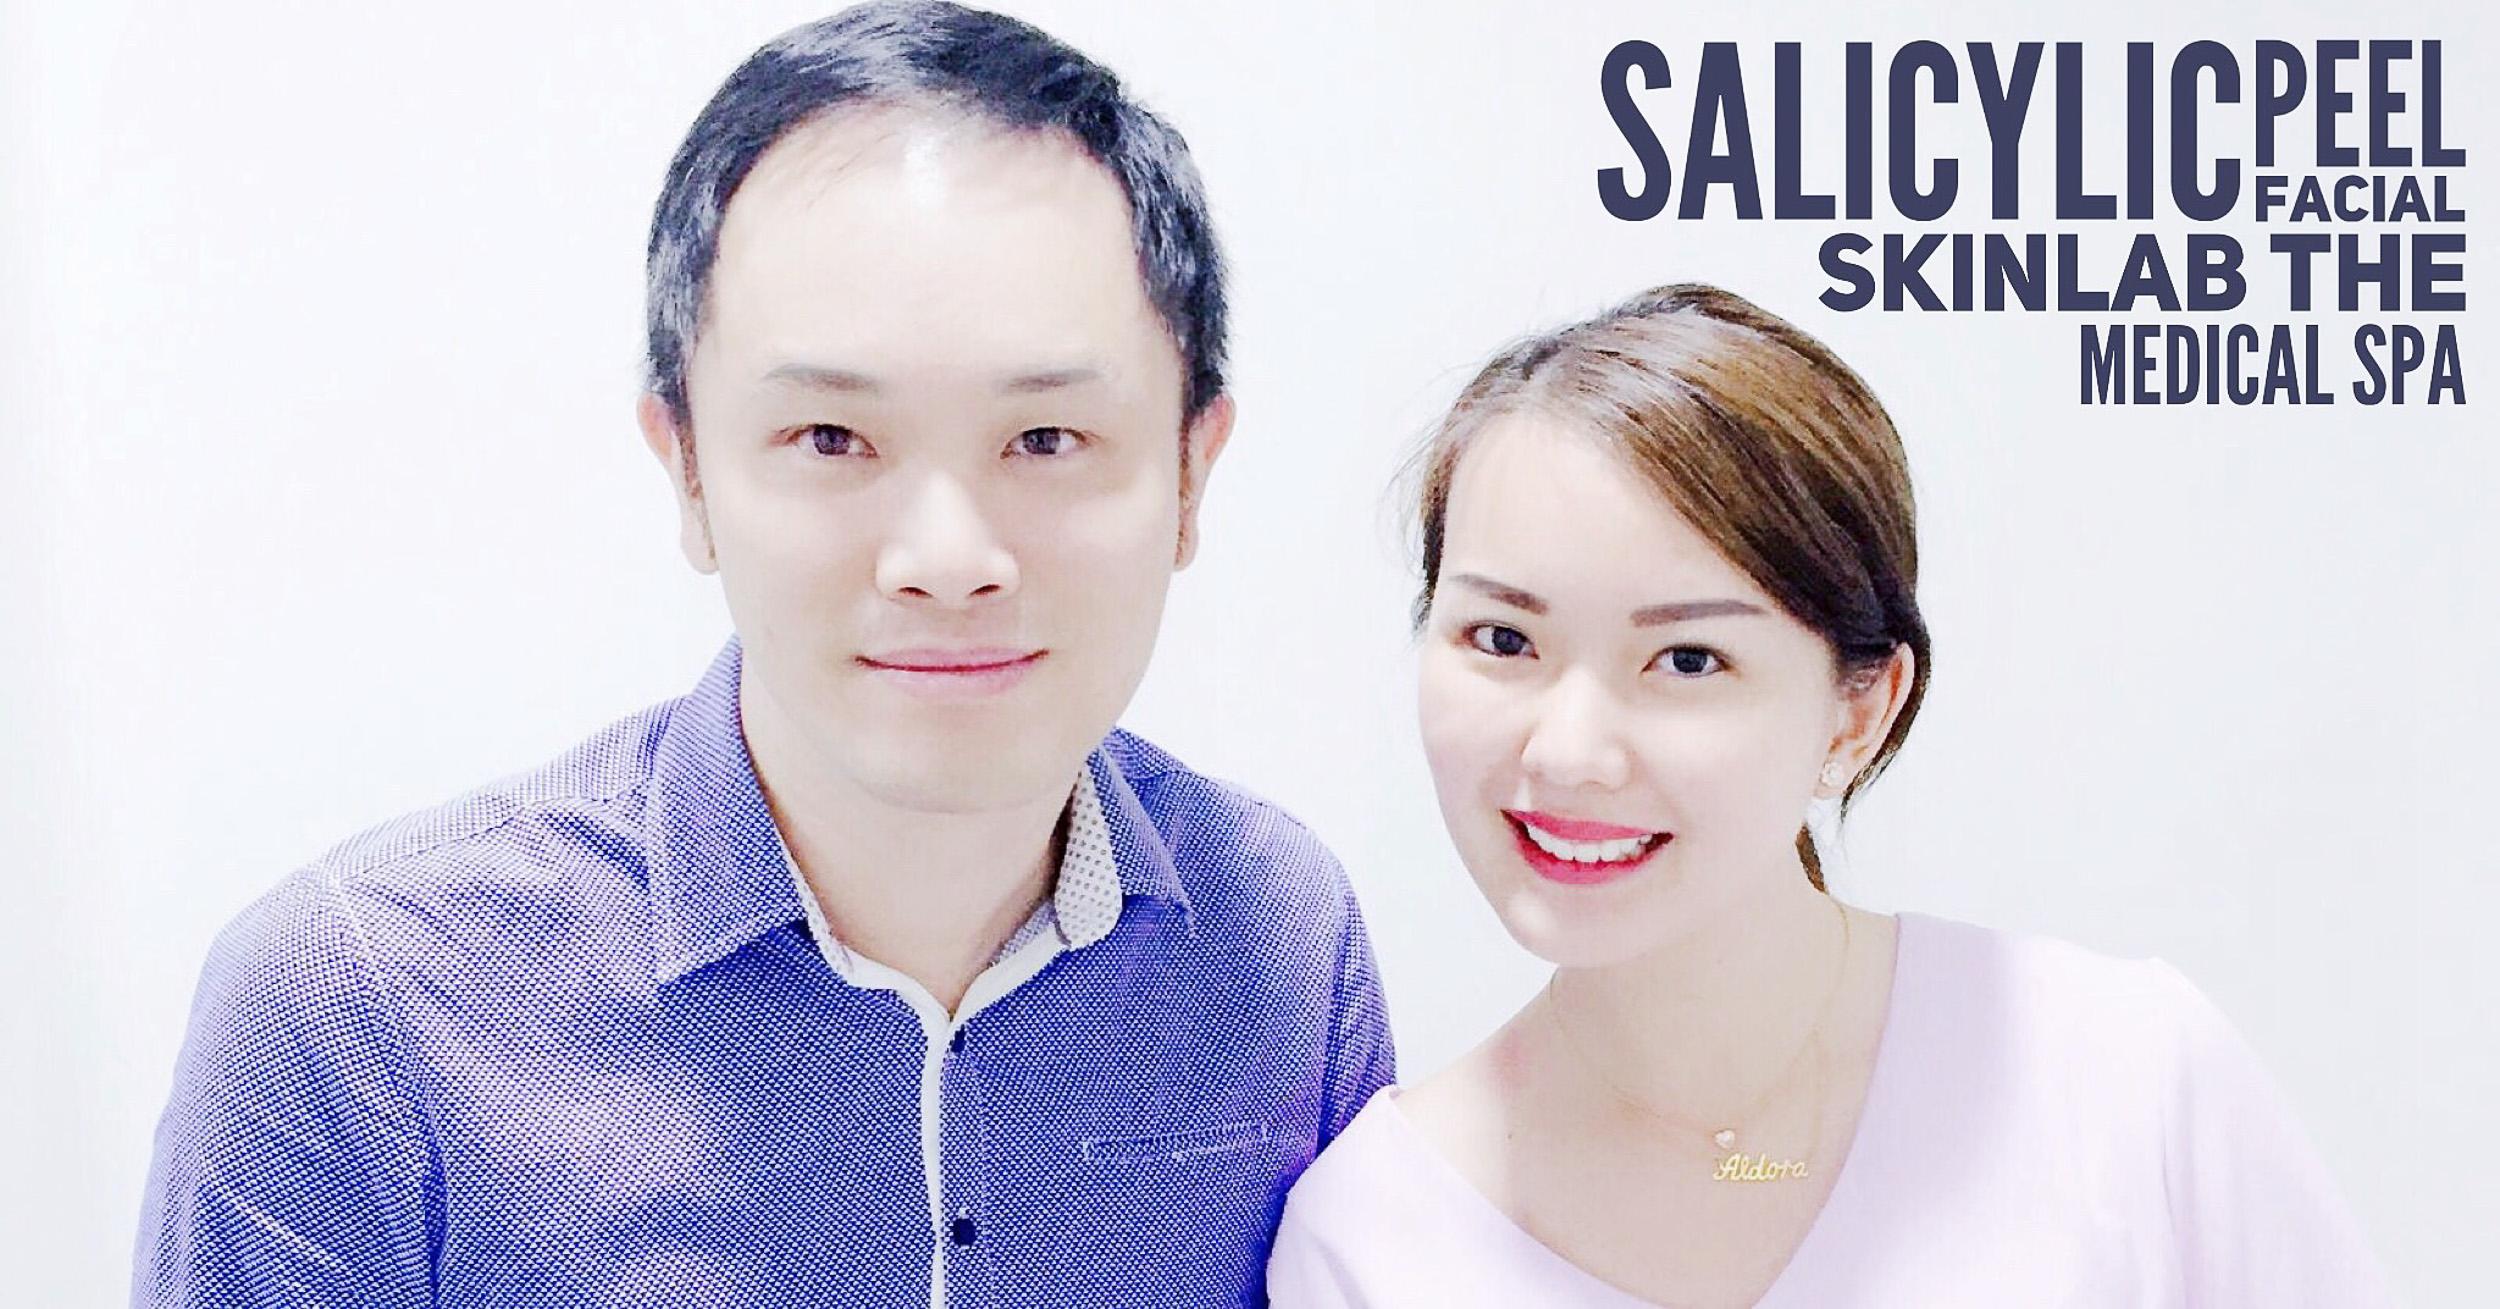 Salicylic Facial 38